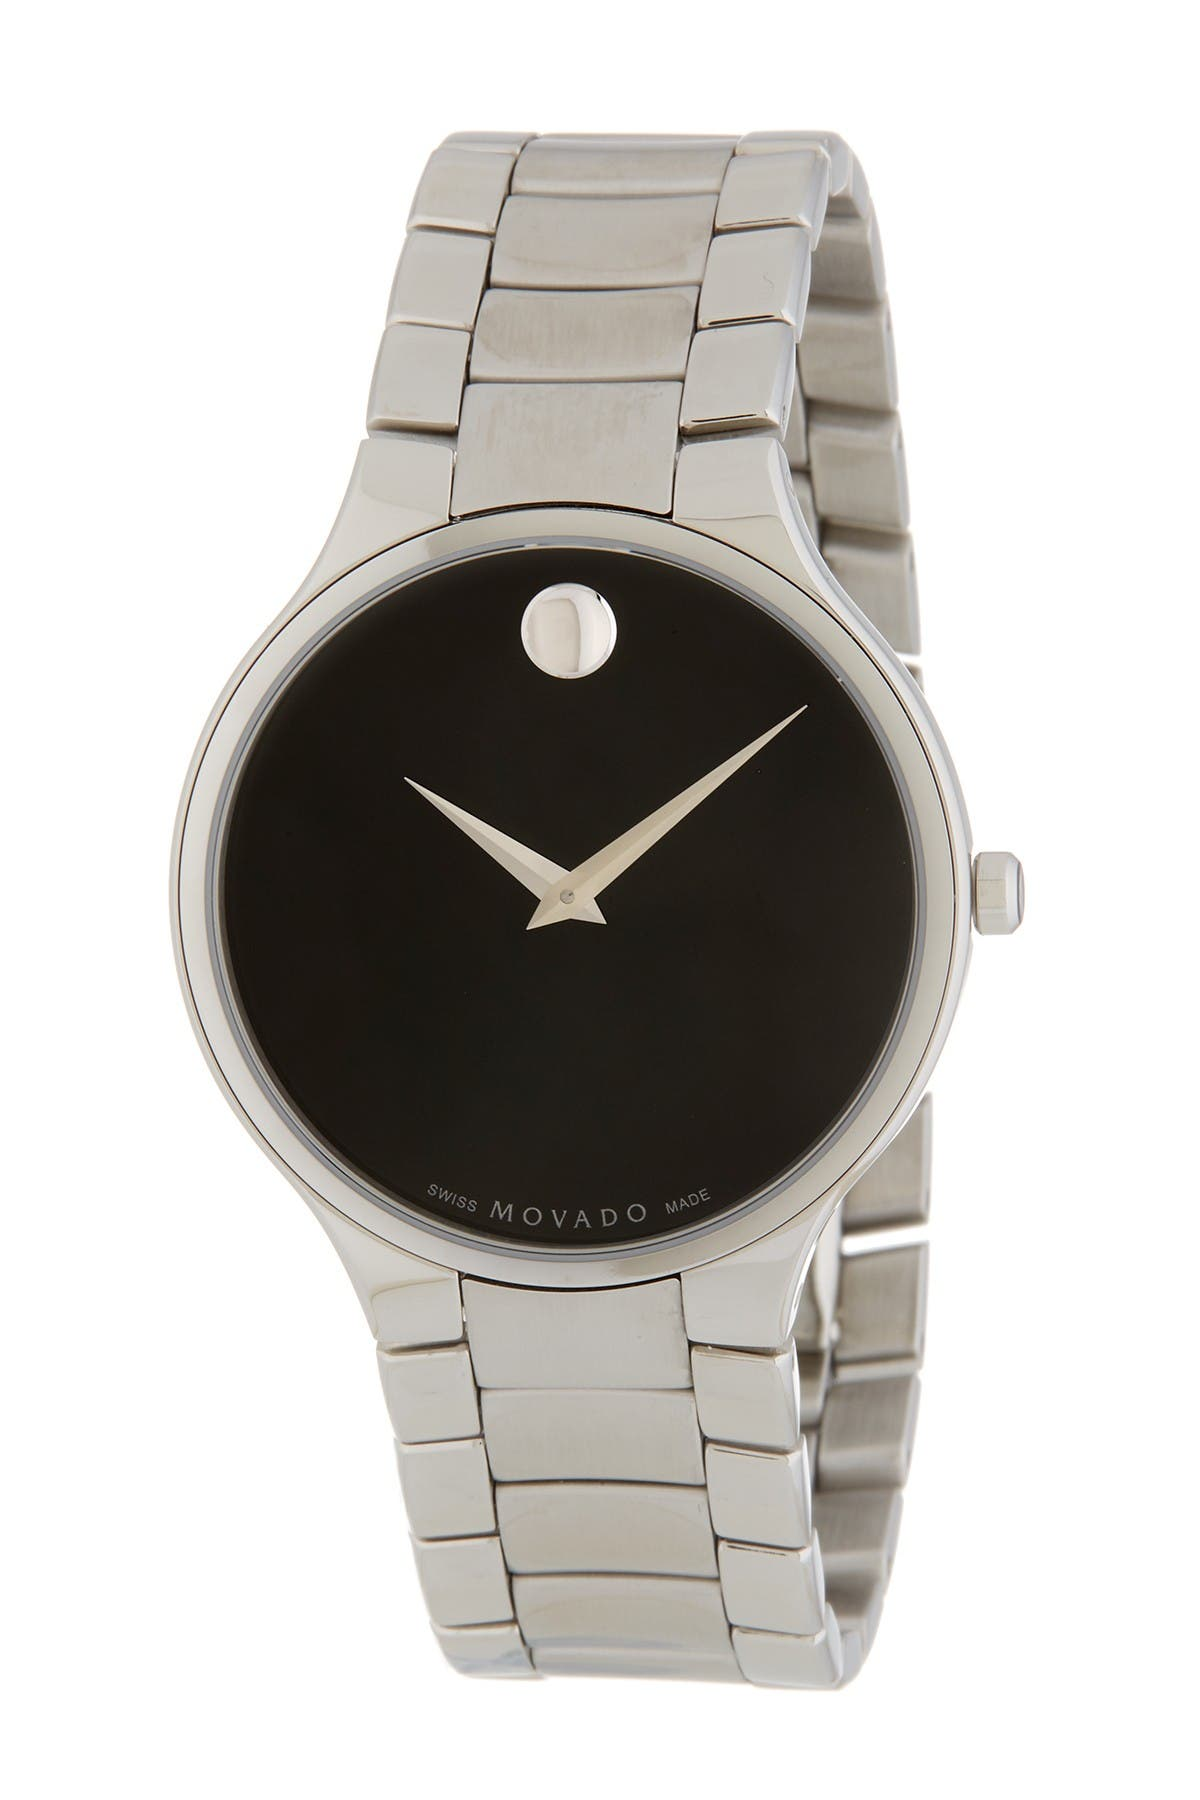 Image of Movado Men's Serio Bracelet Watch, 38mm